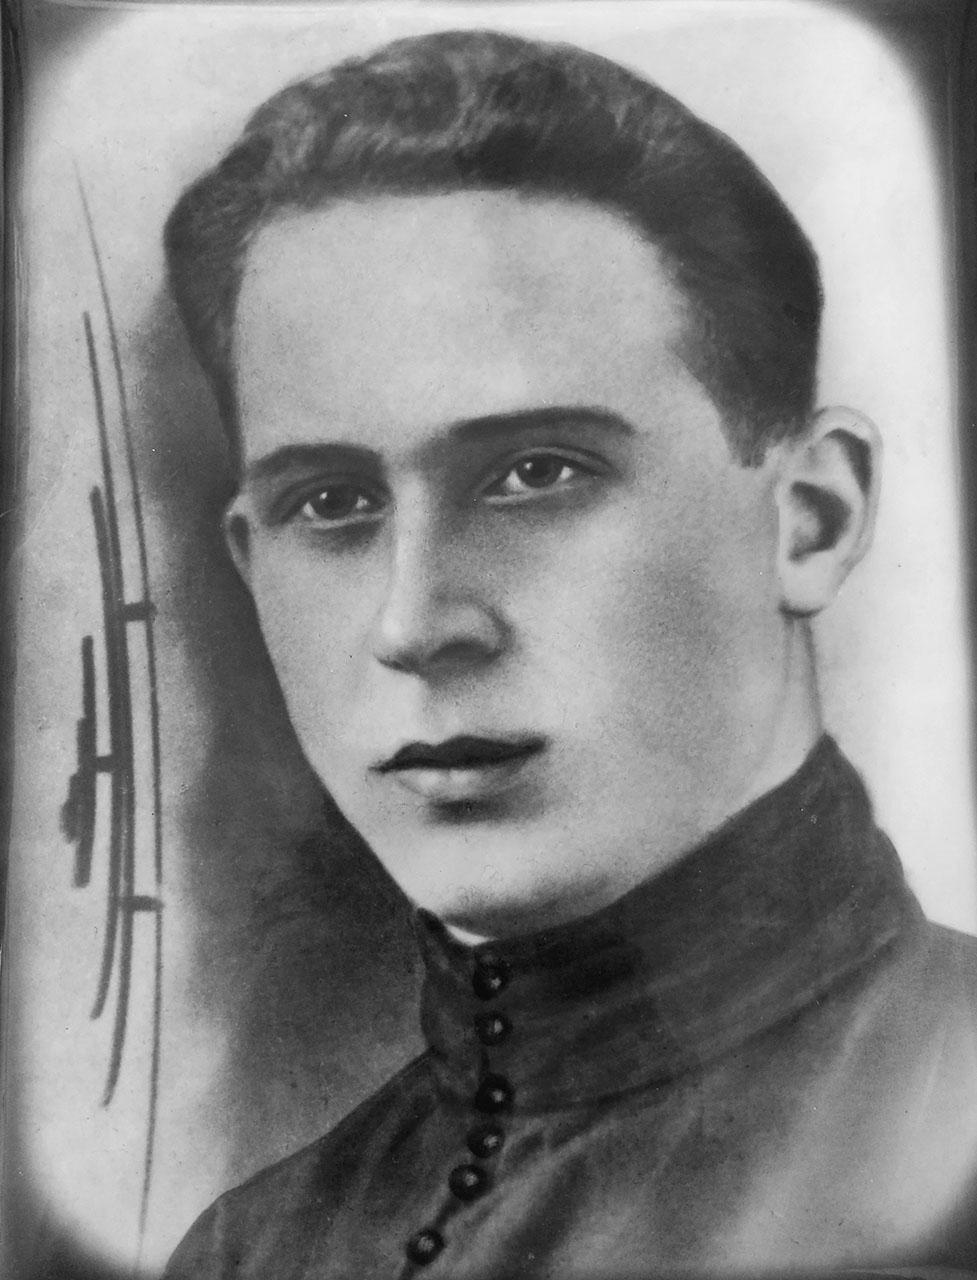 Абрам Исакович Геренштейн. 30-е годы ХХ-го века.